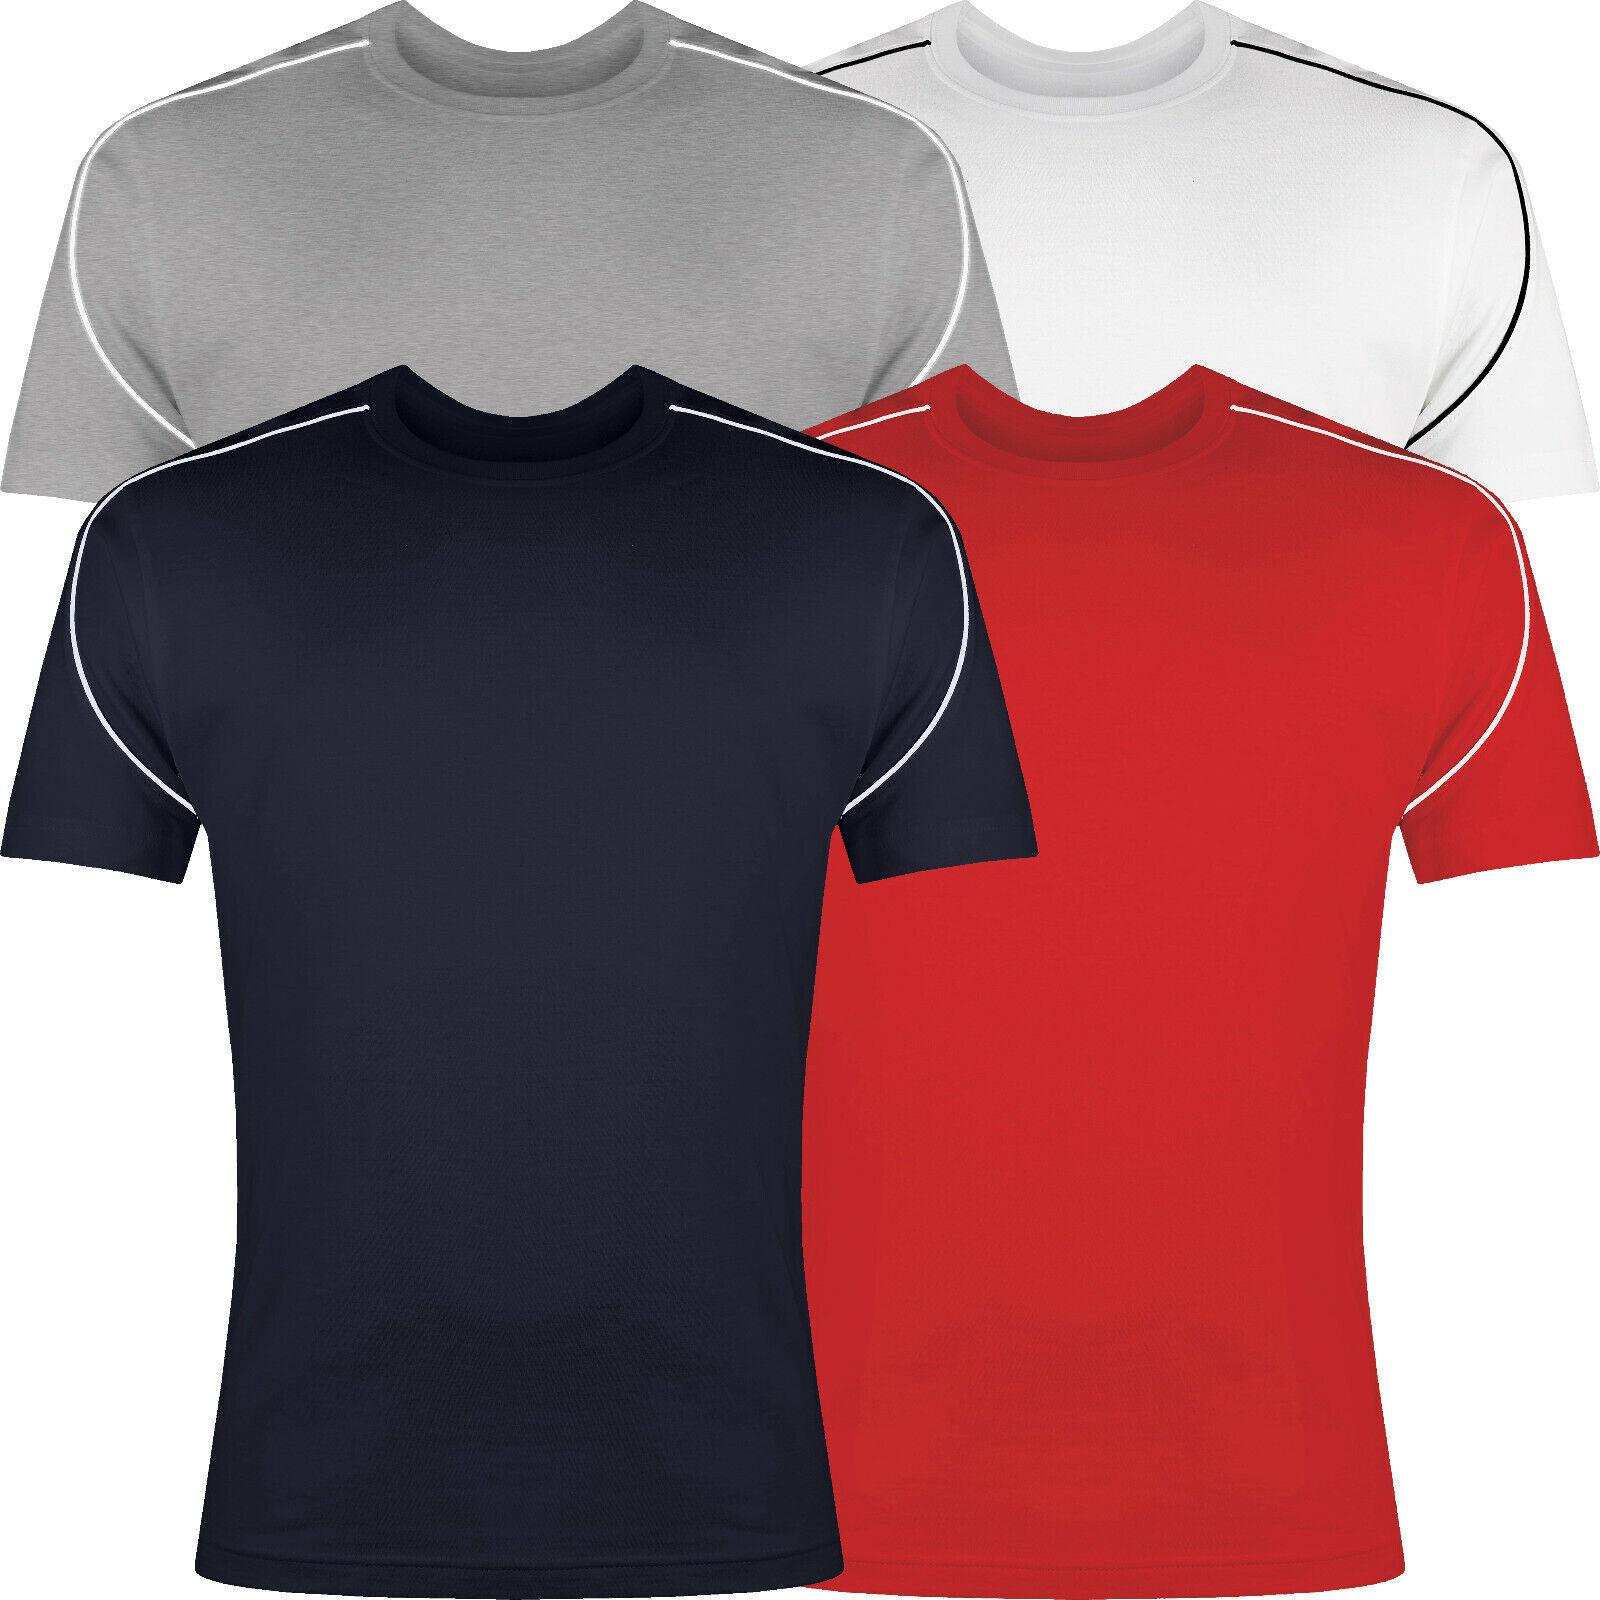 Mens RockBerry Plain 100/% Cotton Casual Short Sleeve Rib Crew Neck T Shirt Top